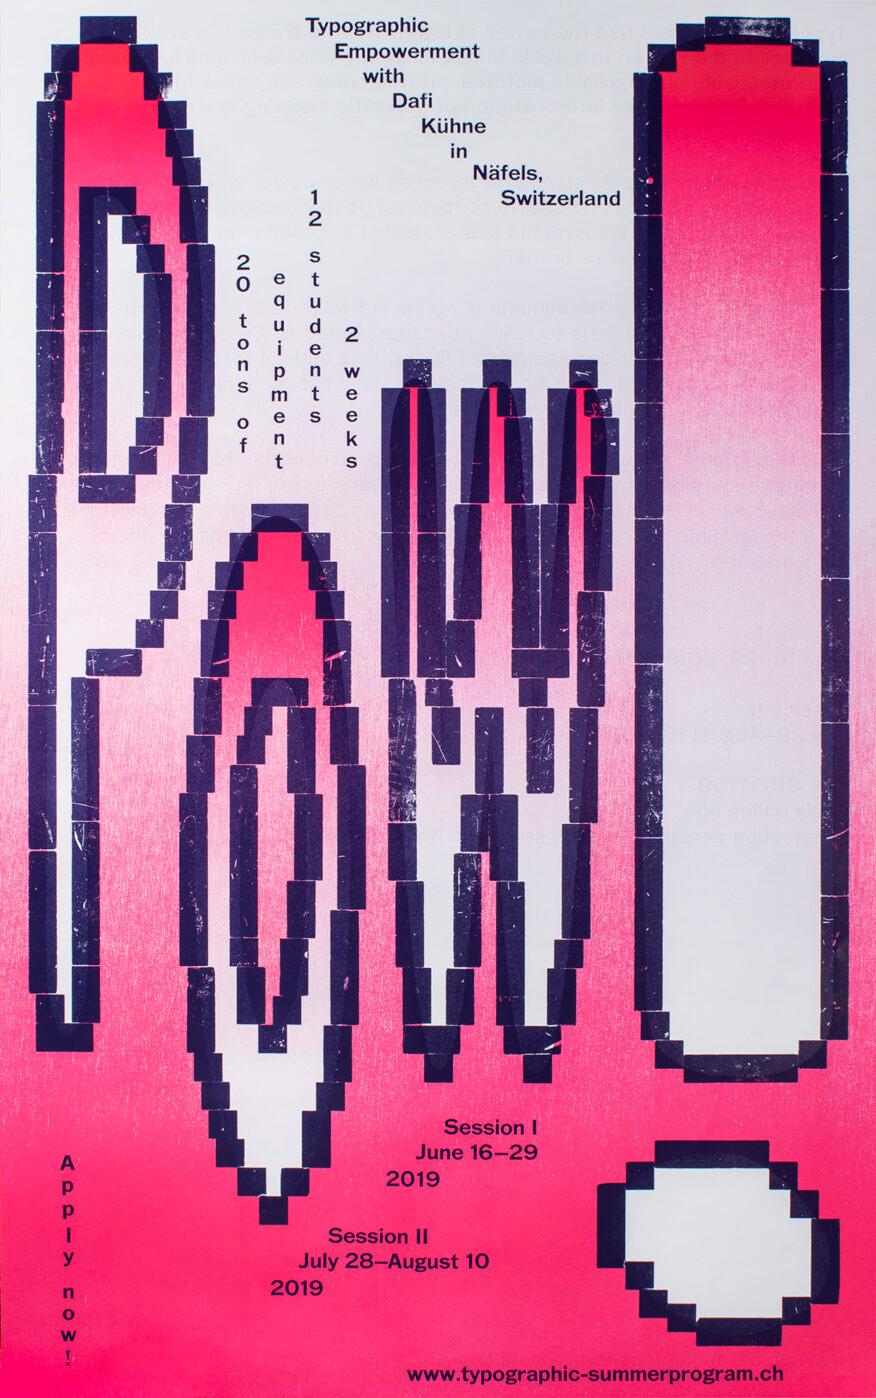 Typographic Summer Program with Dafi Kühne - slanted